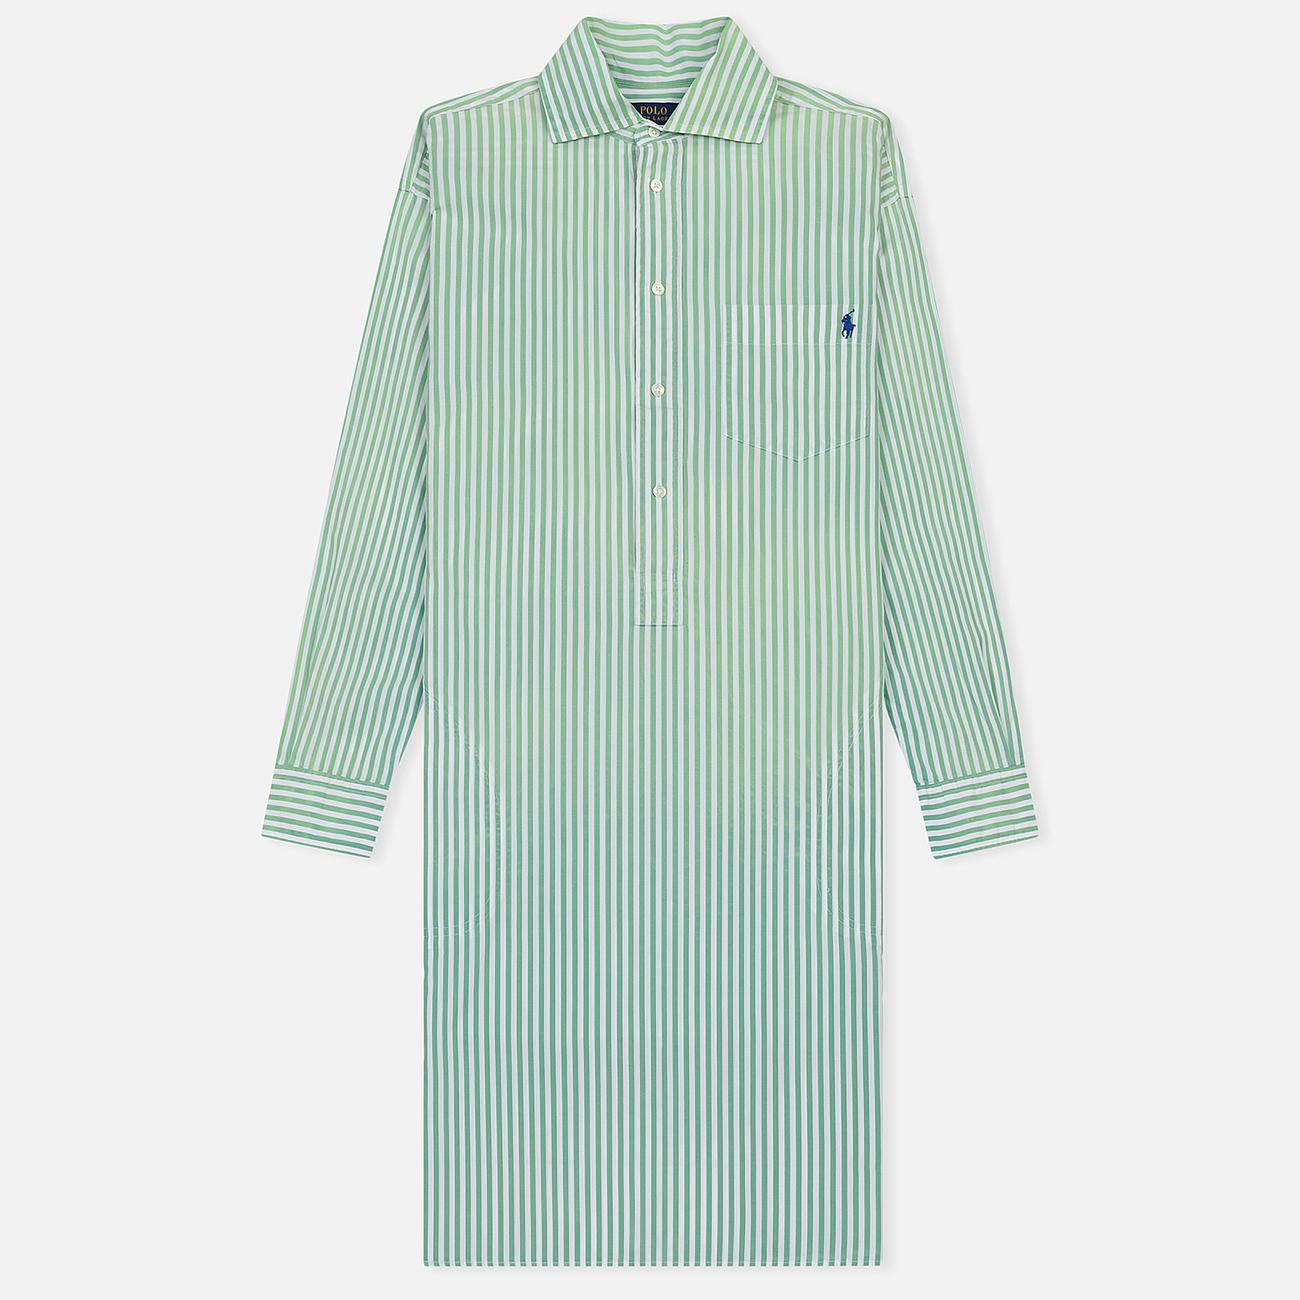 Женское платье Polo Ralph Lauren Chigo LS Sunfade Stripe Seafoam Green/White